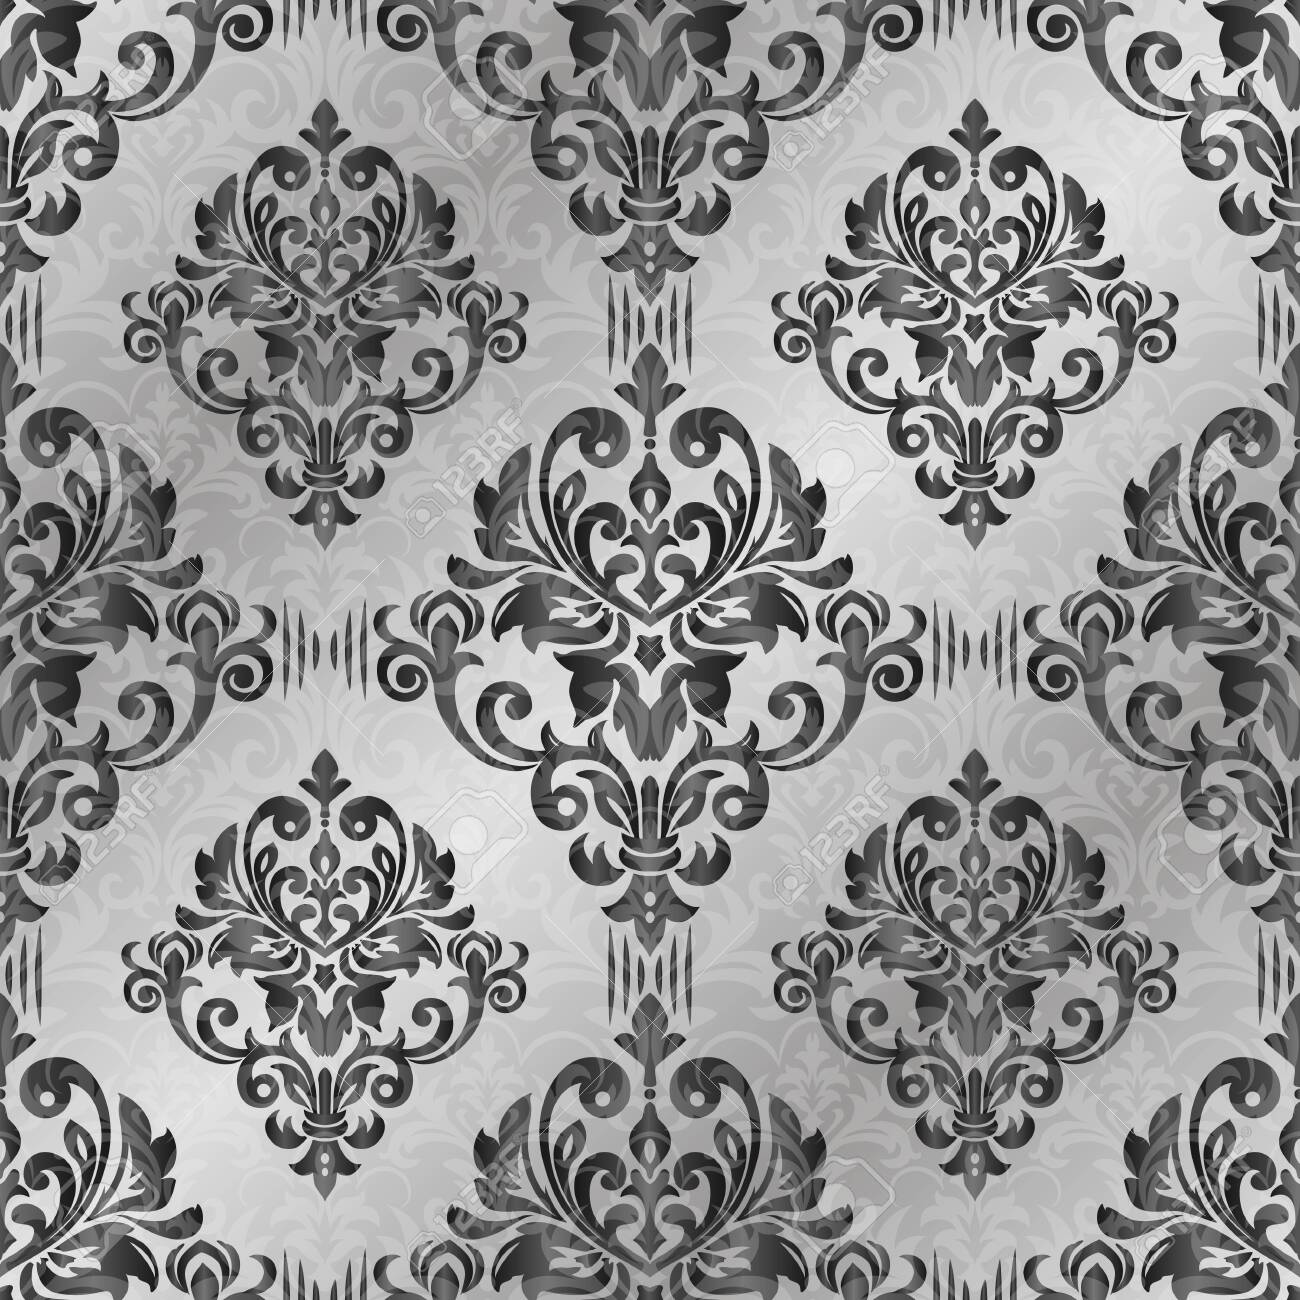 Damask seamless pattern for design. Vector Illustration - 137336054